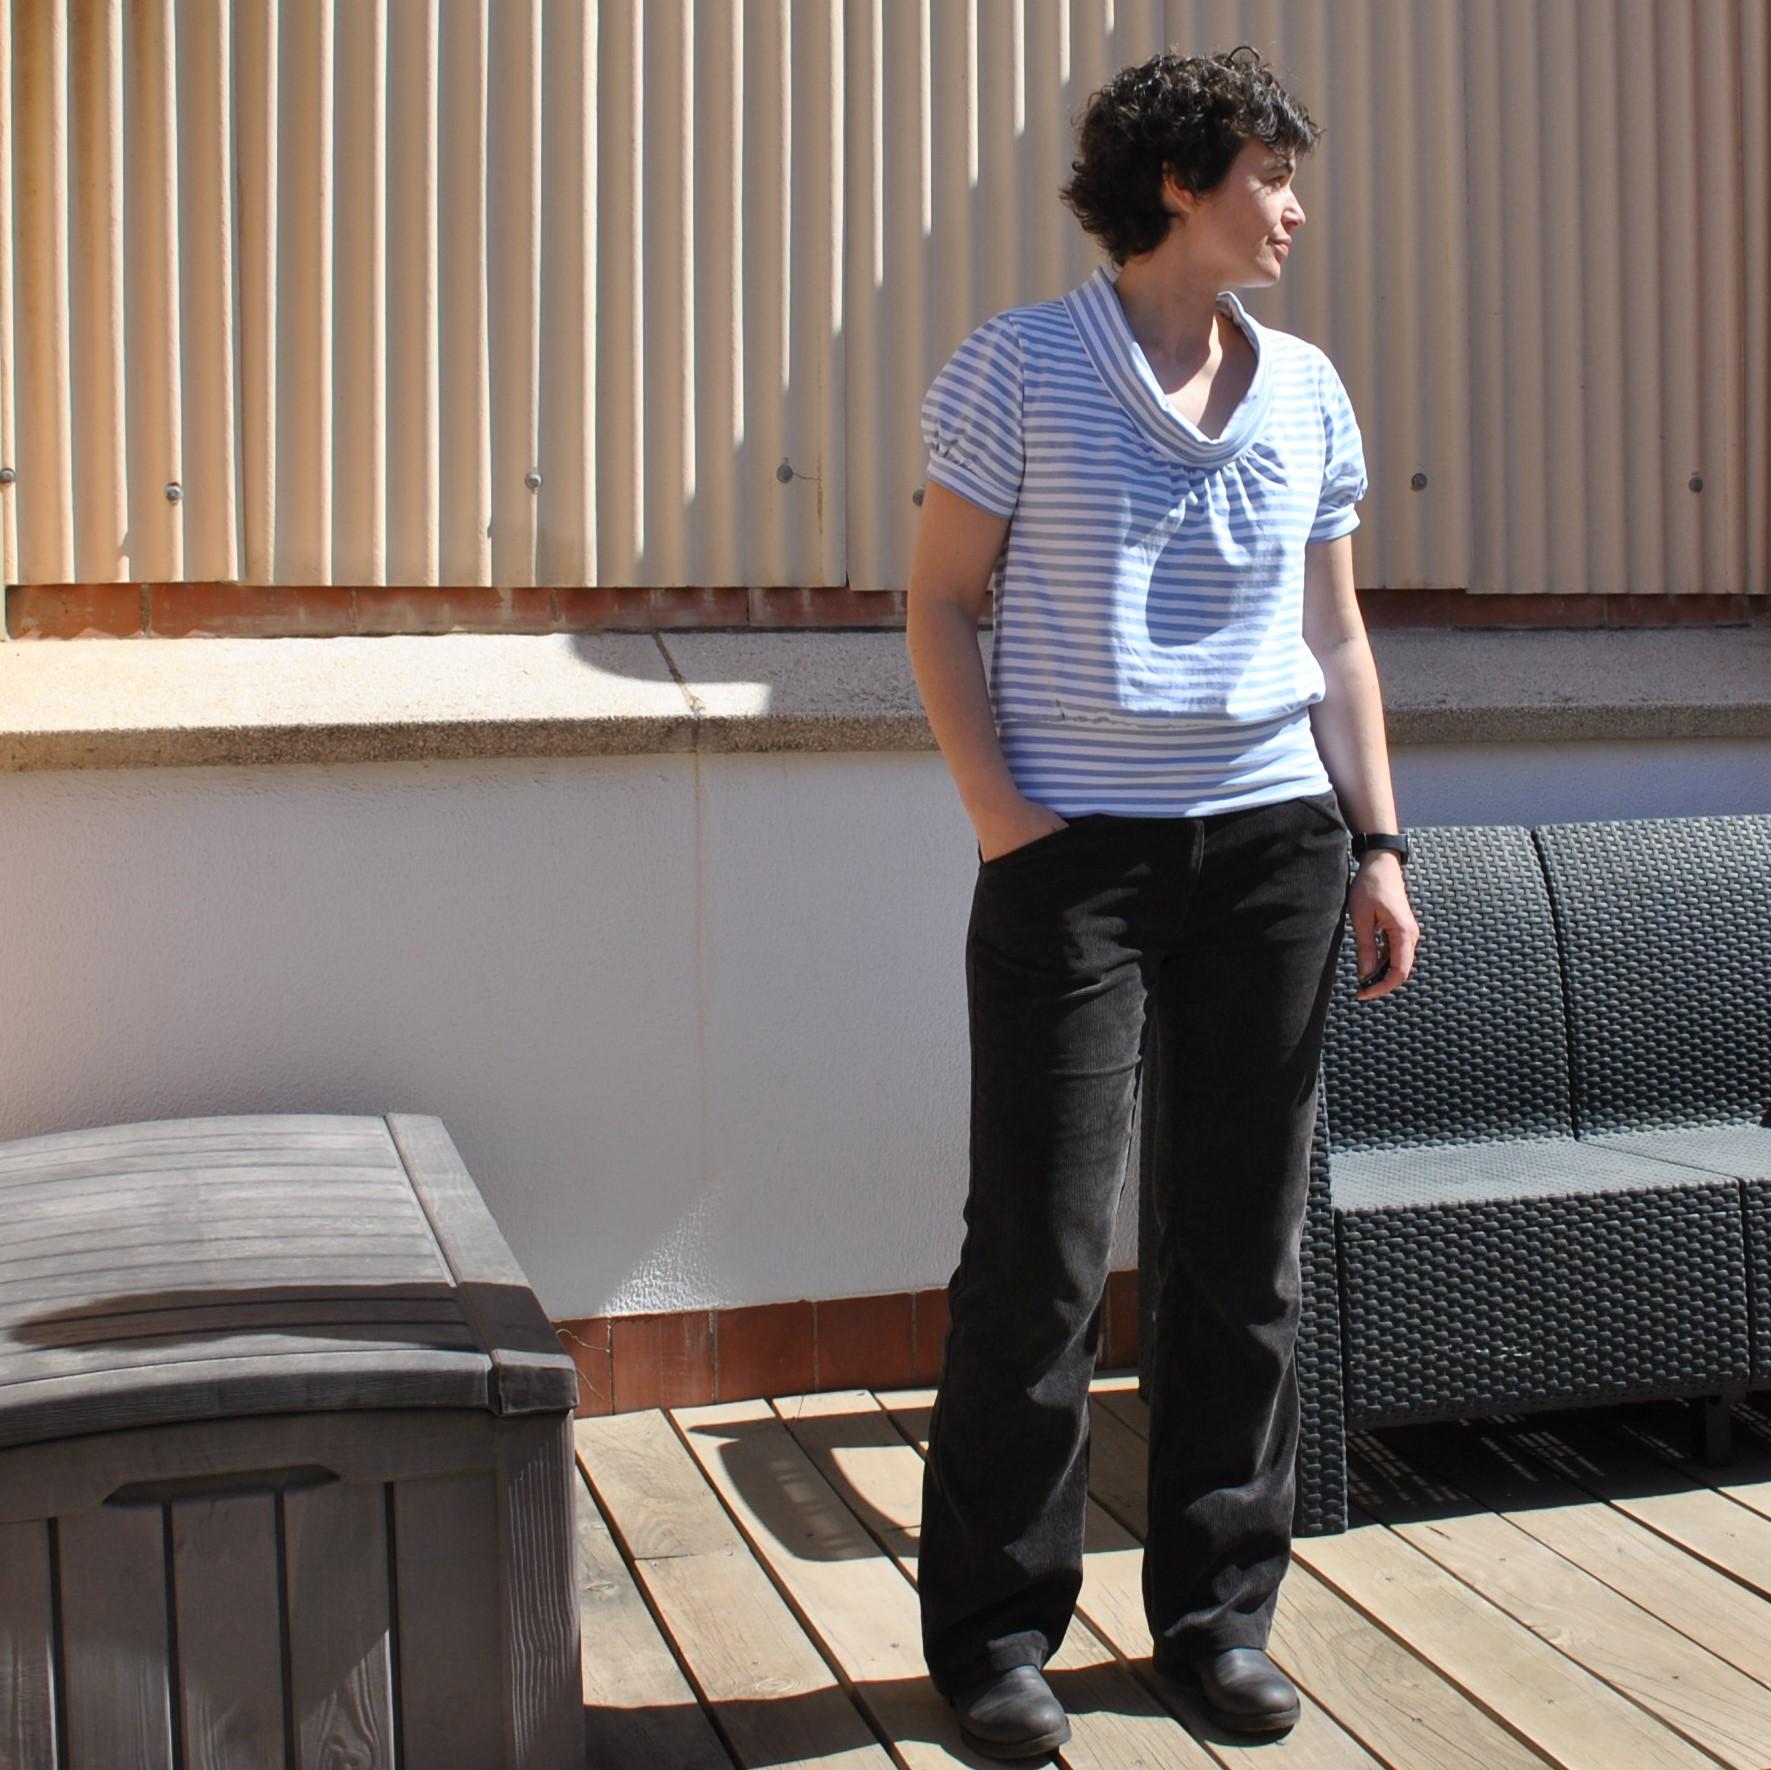 Thurlow en pana + camiseta (17)